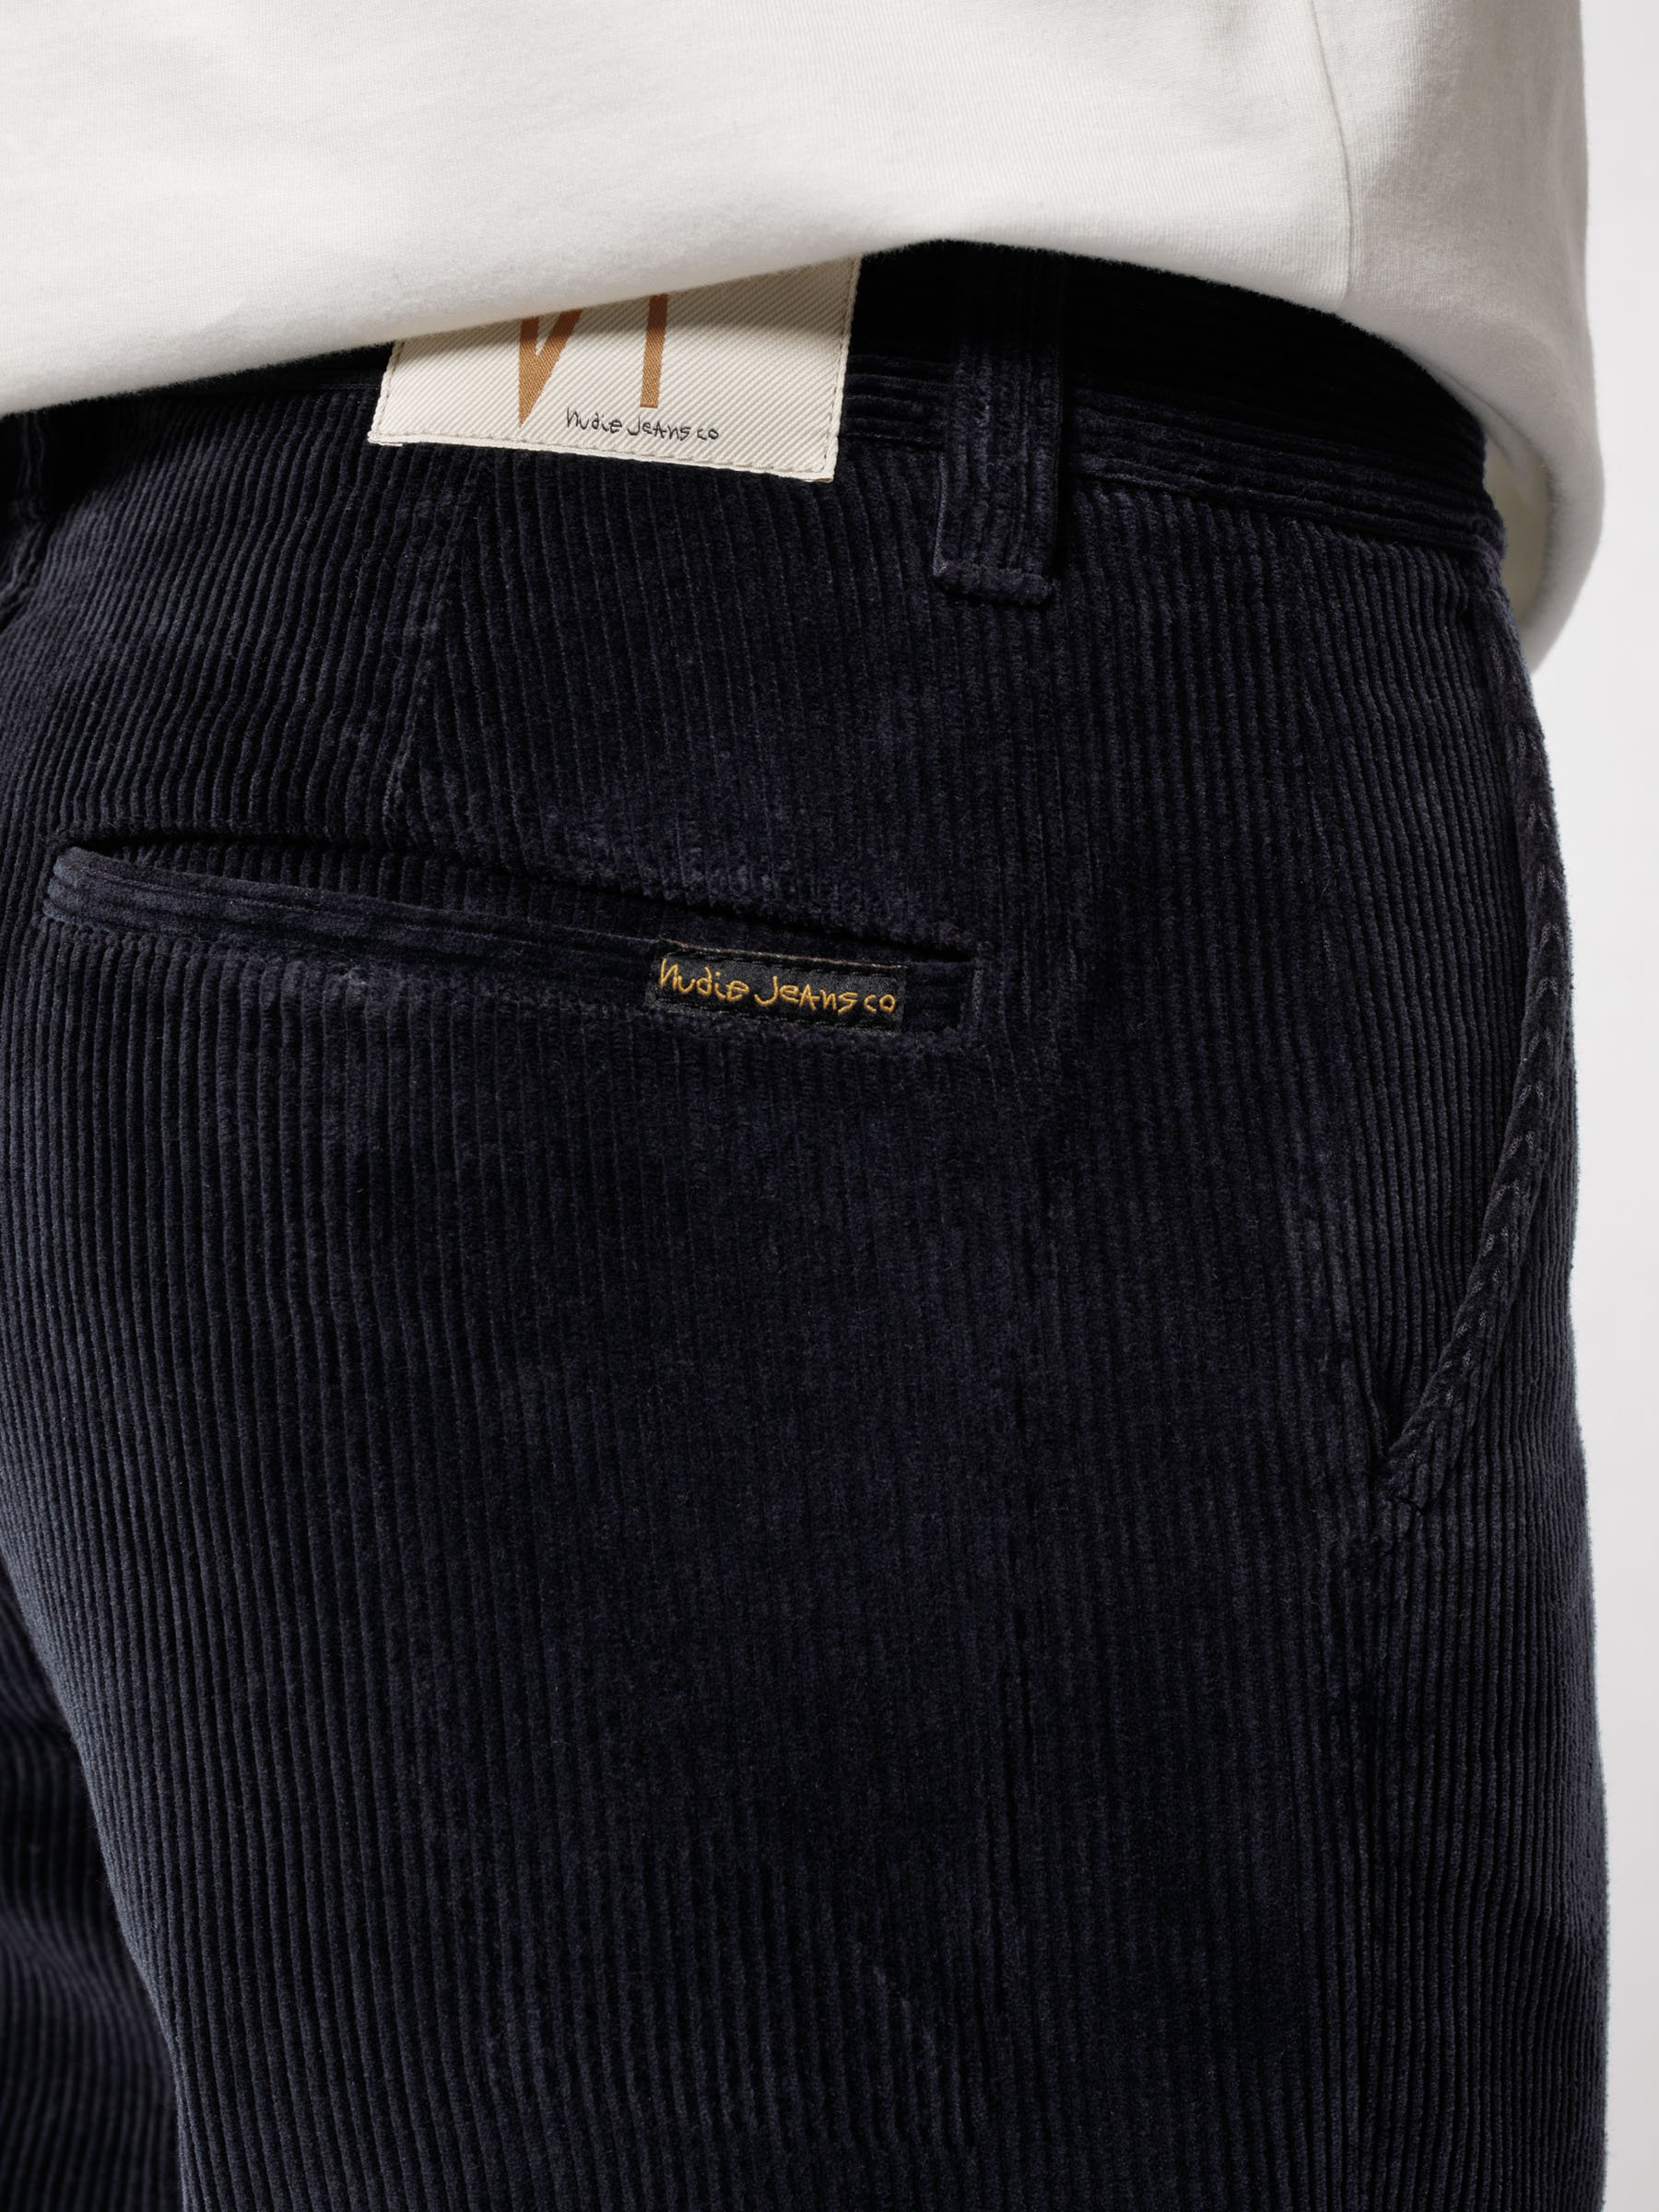 mespromenades-le-pantalon-dautmne-nudie-jeans-Lazy-Leo-Cord-Navy-120188-24_2400x2400